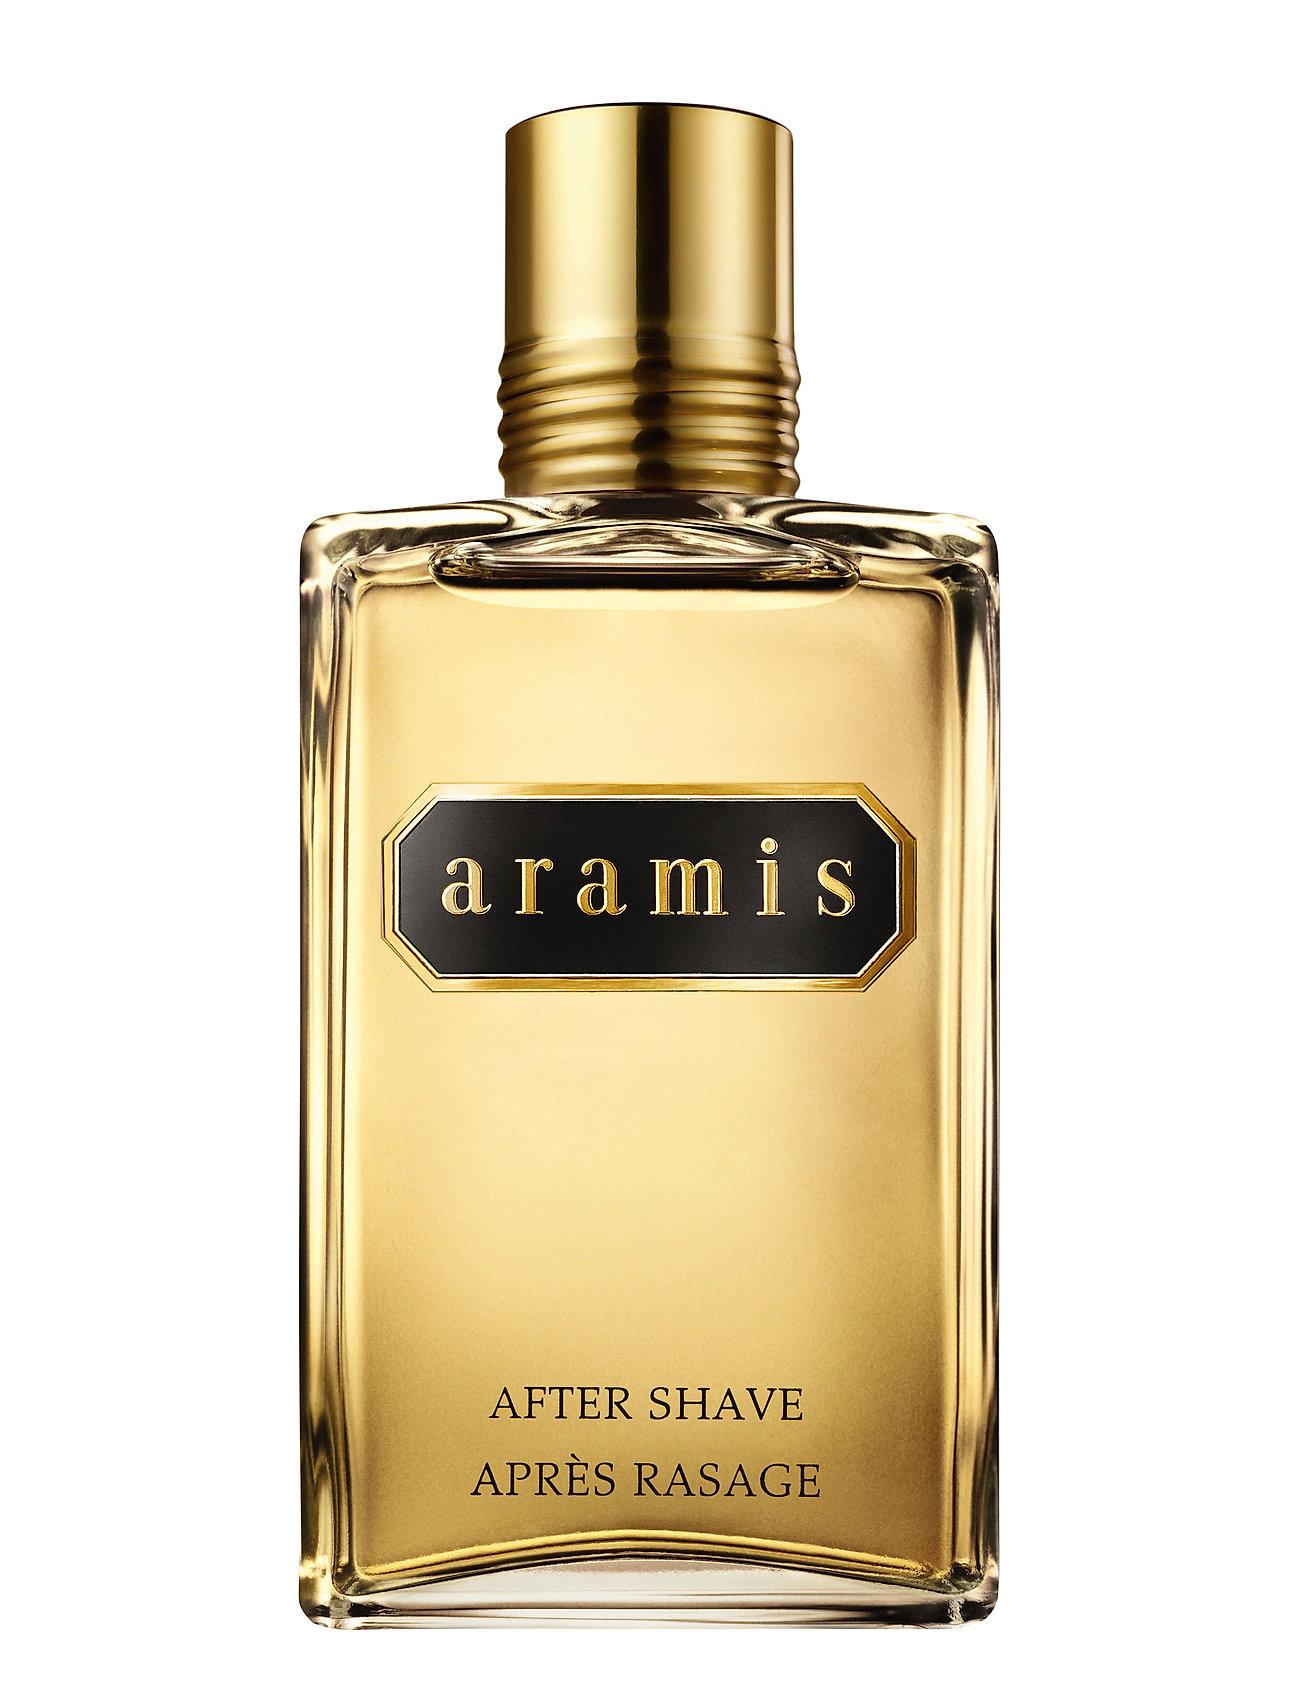 aramis – Aramis aramis aftershave fra boozt.com dk